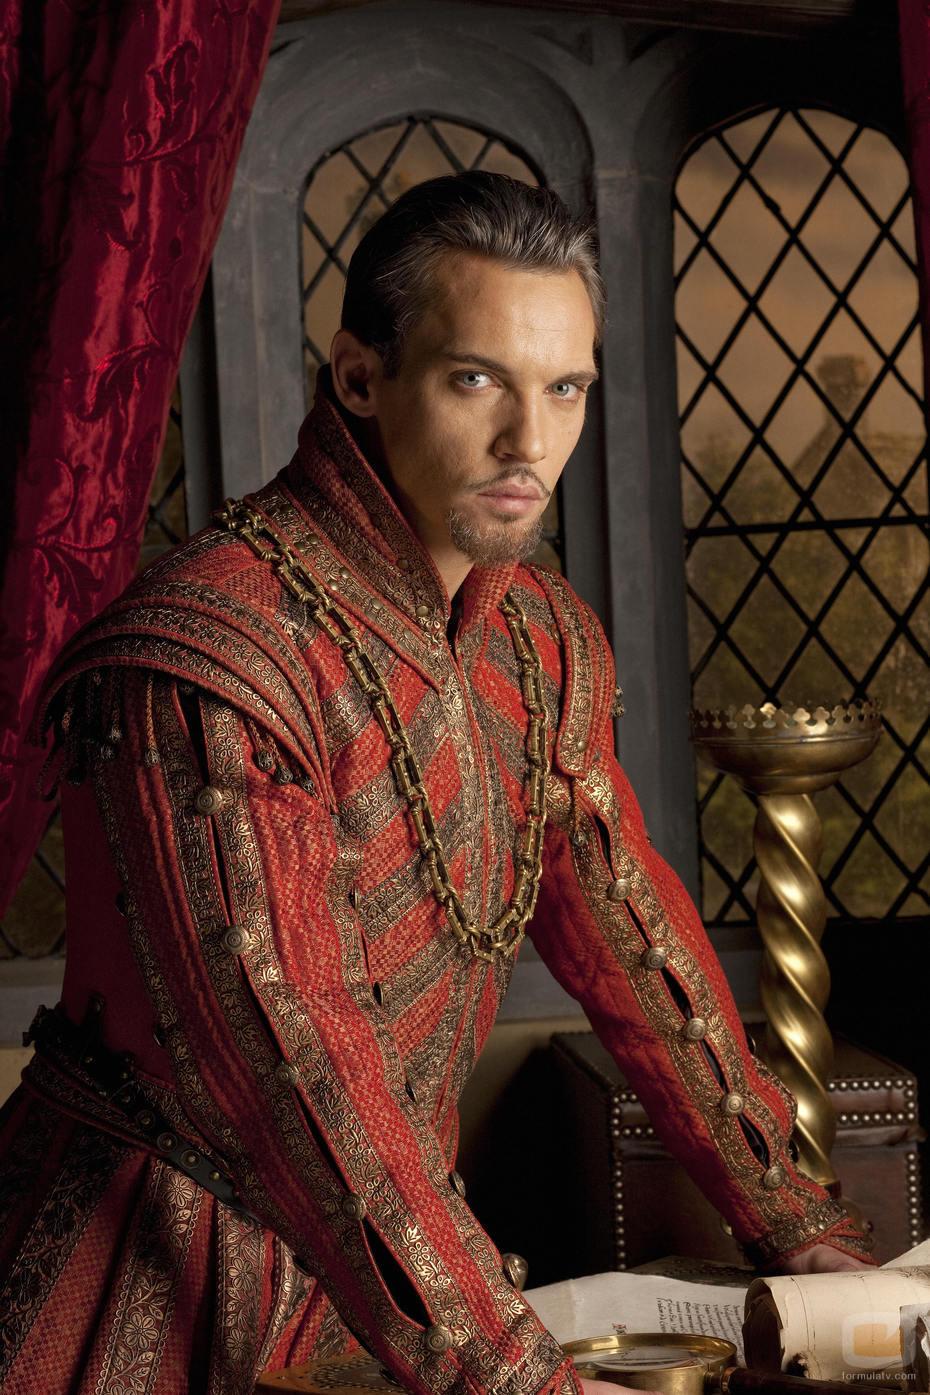 Jonathan Rhys Meyers The Tudors Season 4 Jonathan Rhys Meyers P...